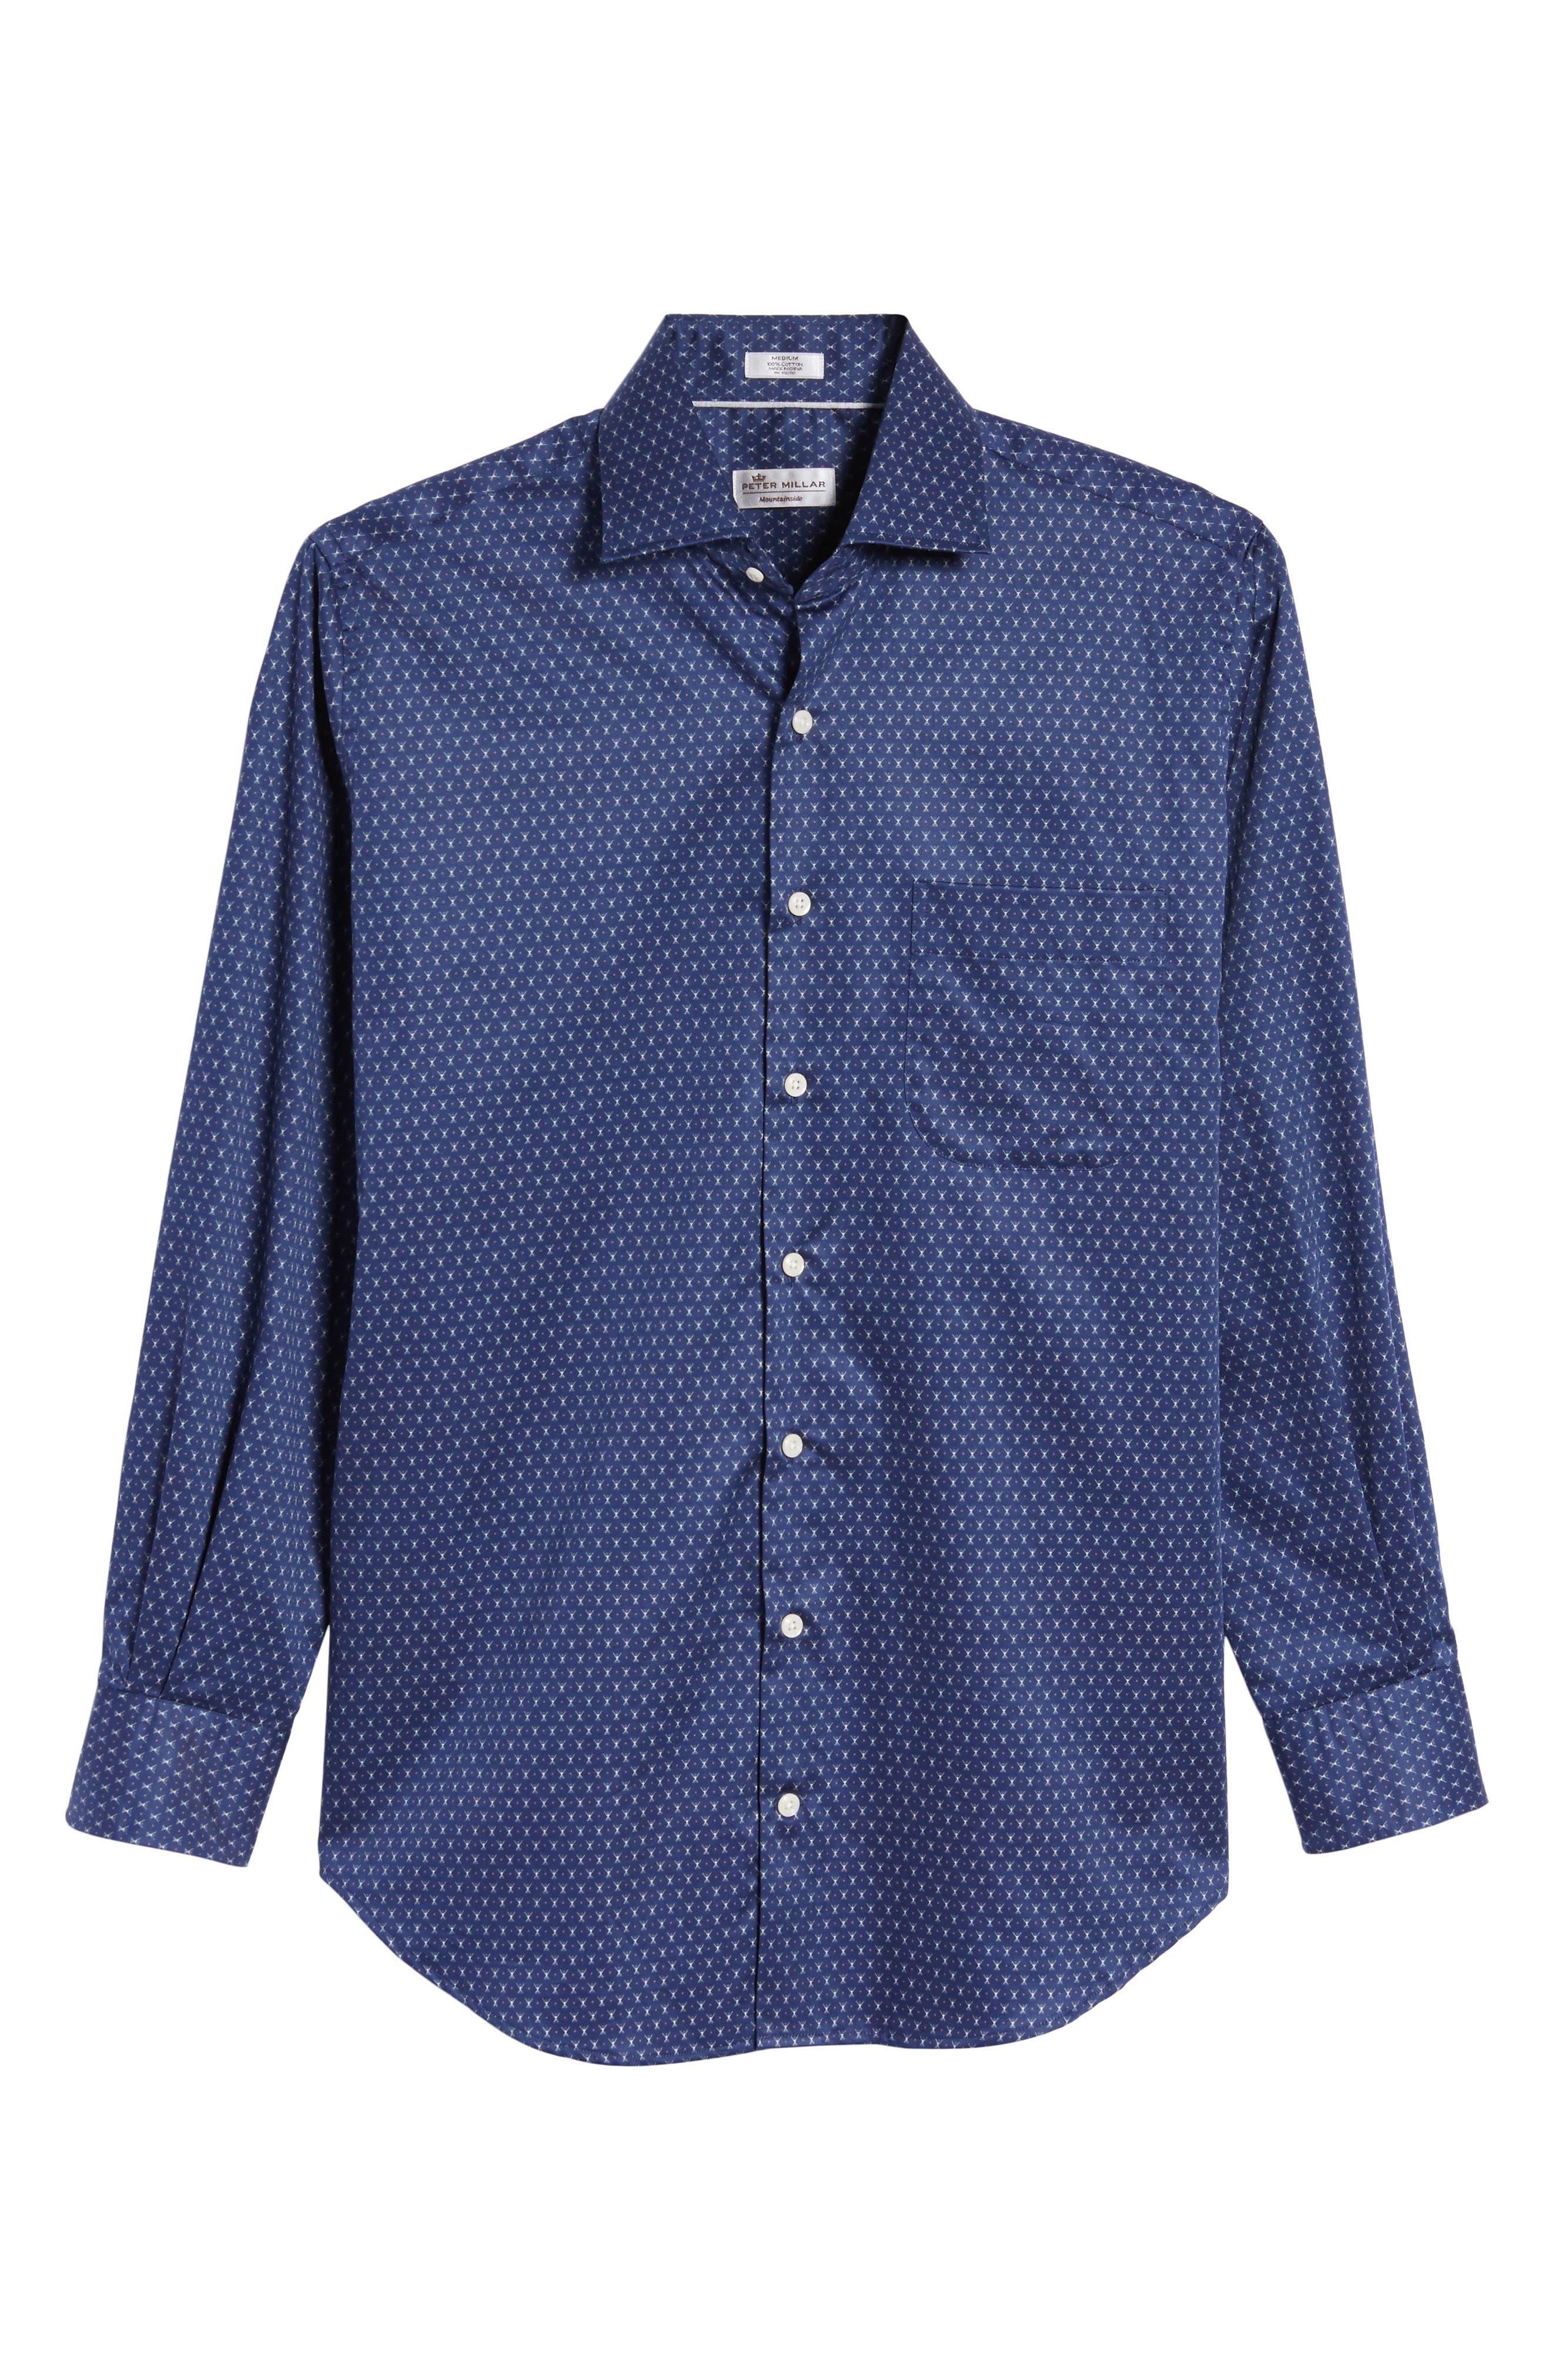 Cross Country Regular Fit Print Sport Shirt,                             Alternate thumbnail 6, color,                             424